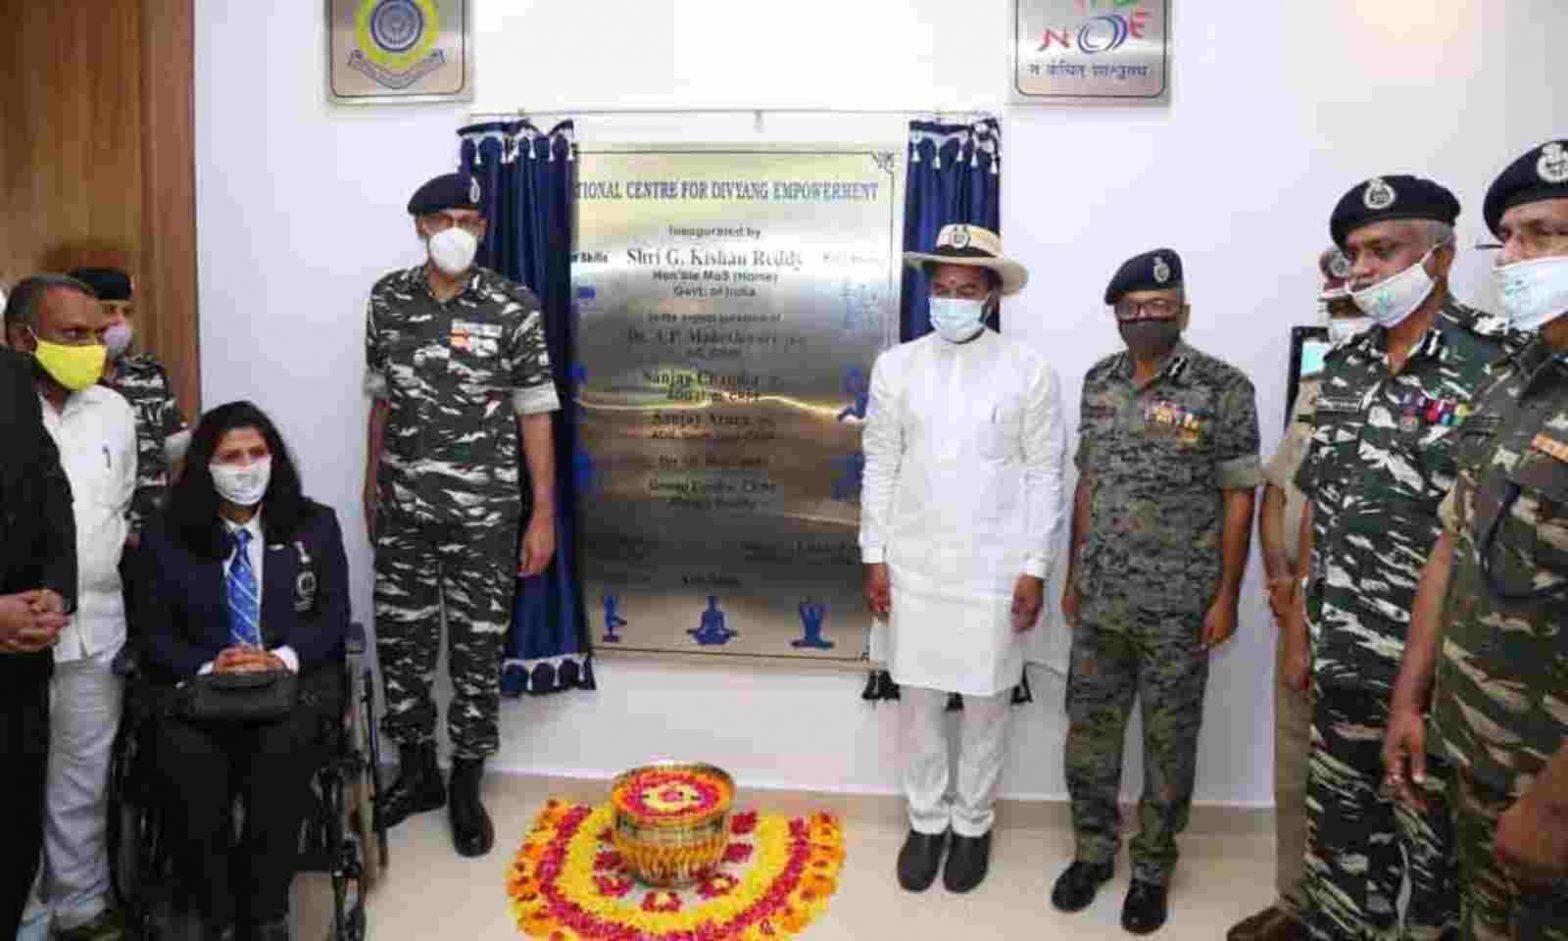 National Centre for Divyang Empowerment inaugurated in Telangana_40.1